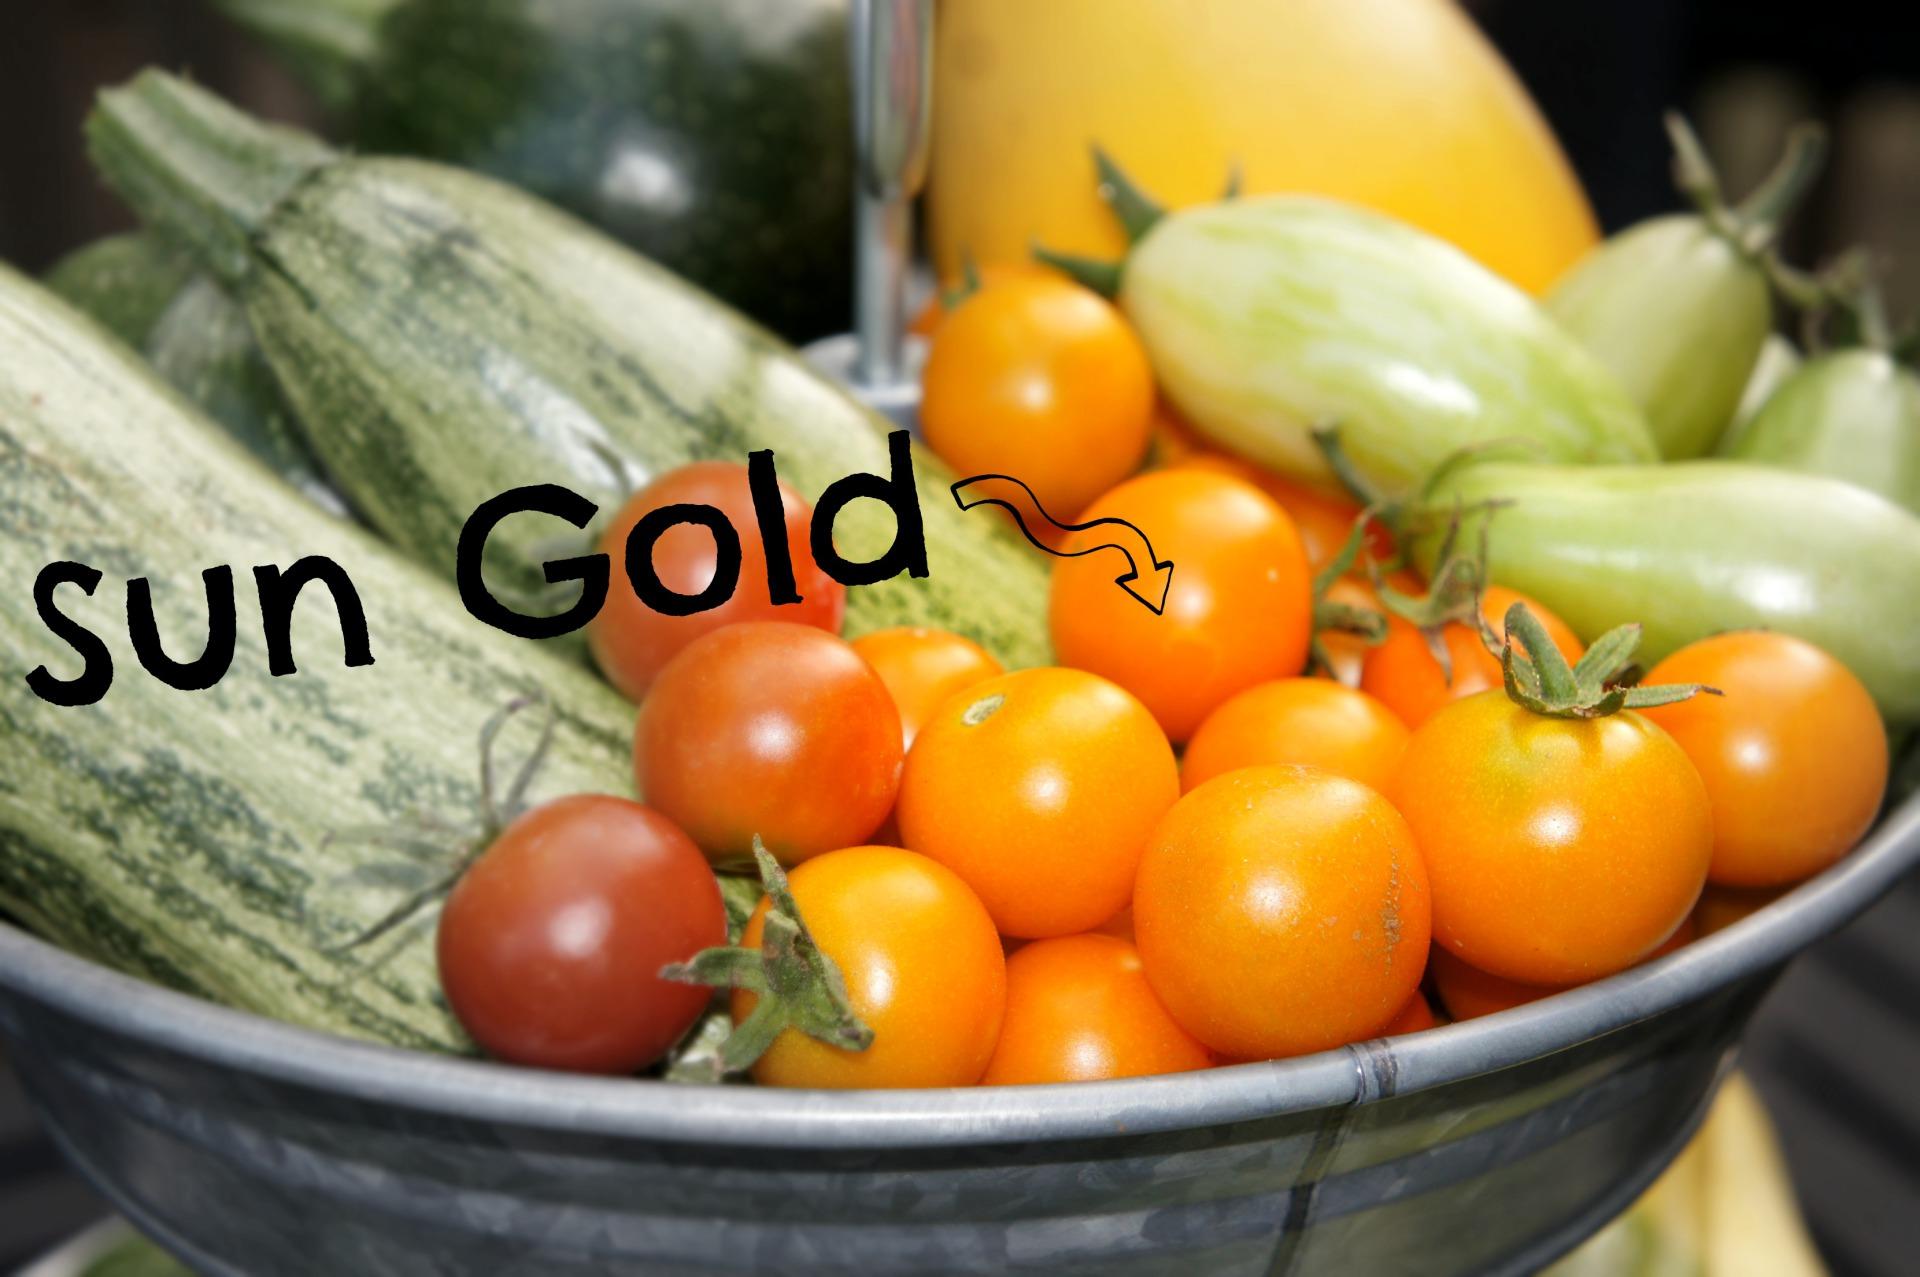 Sun Gold Tomatoe and other Veggies